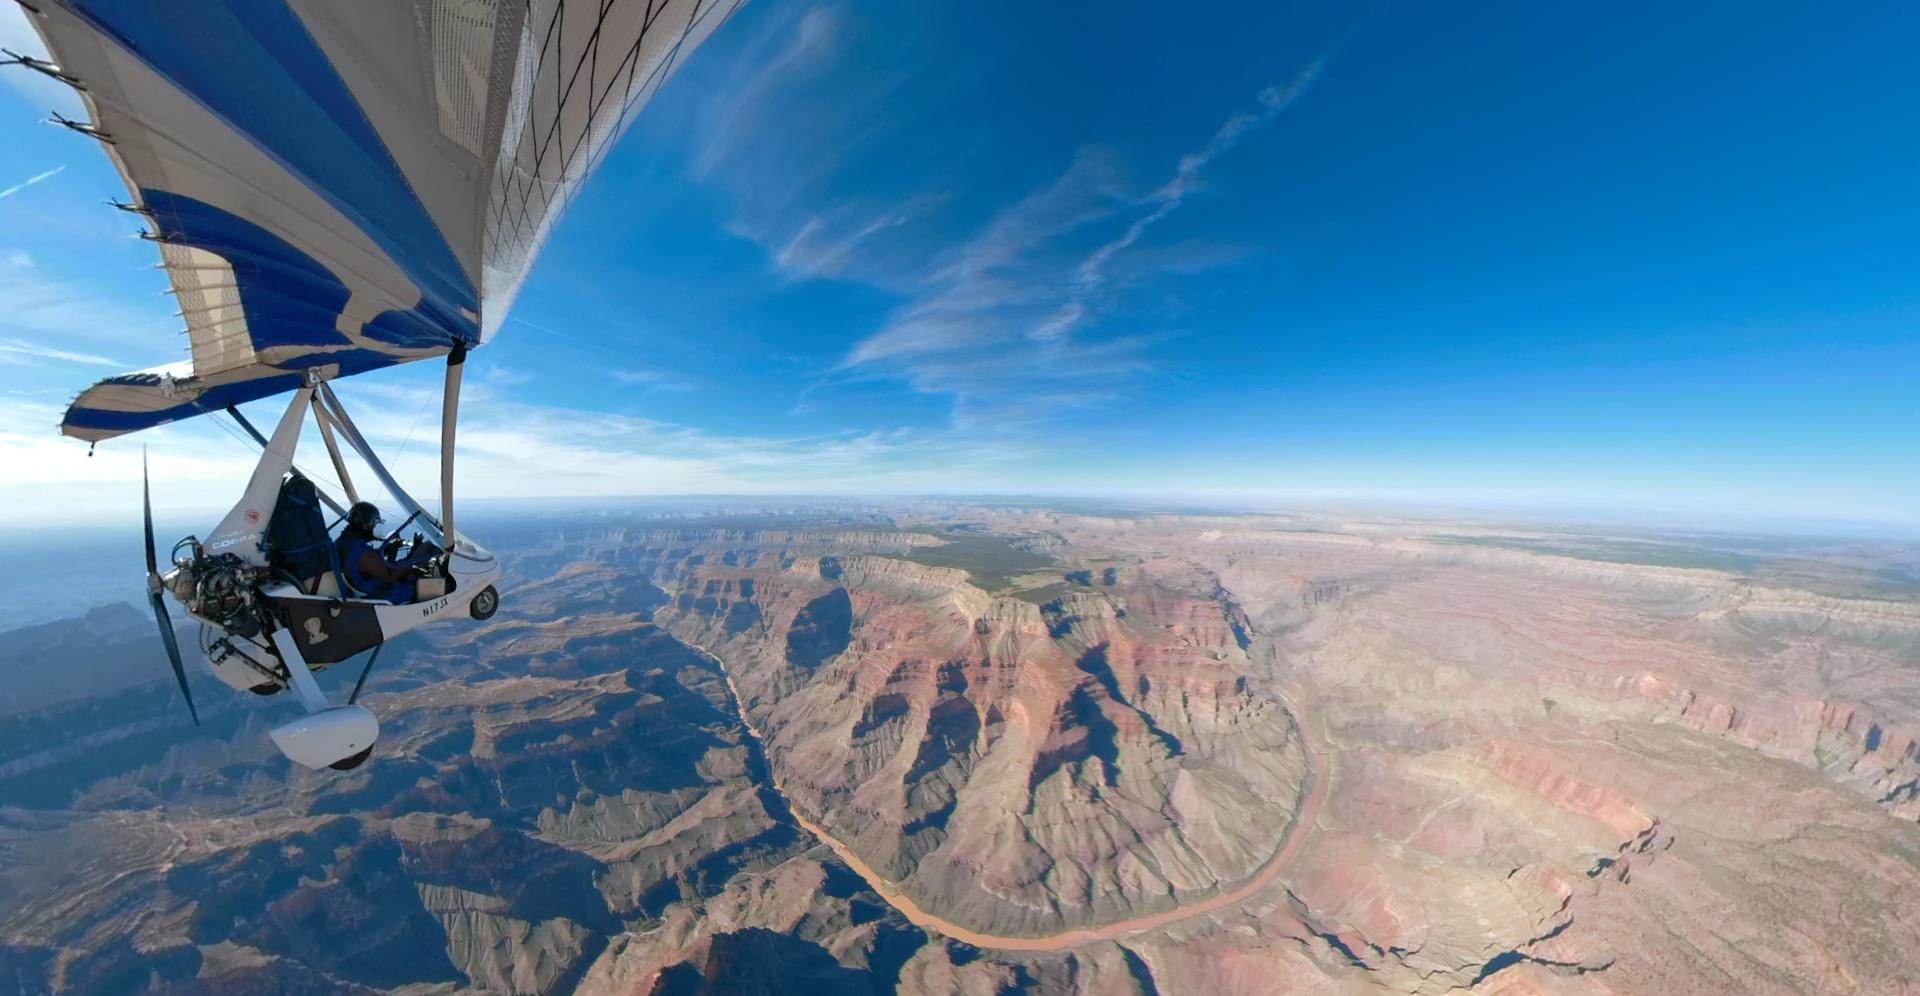 http://www.jeffsflightlog.com/2018/2018_10_28_marble_bar10.pdf Day 2 of my Grand Canyon Trip. Marble